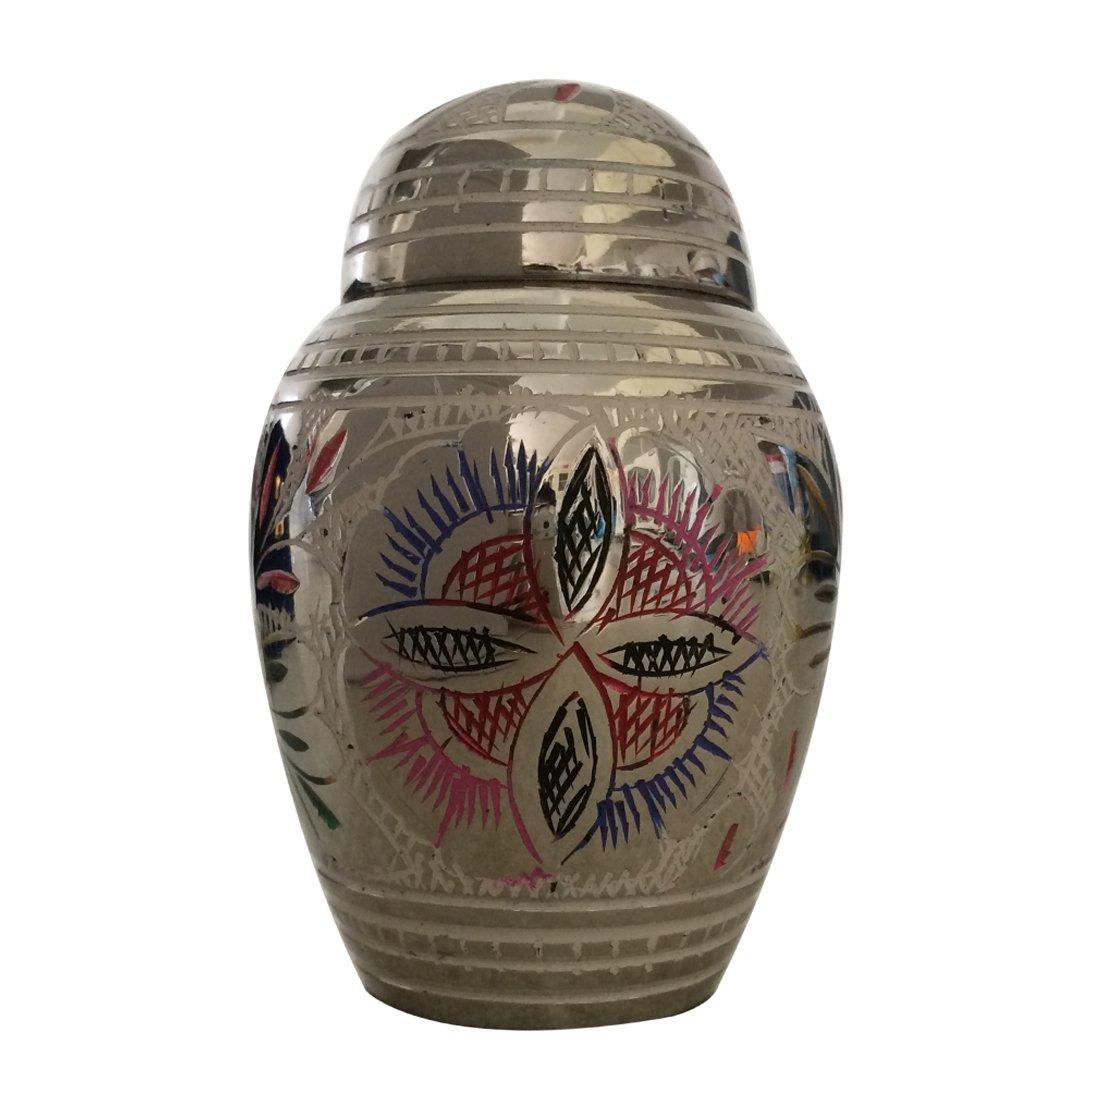 Farnham Flower Keepsake Urn with Enamel Color, Mini Urn for Ashes